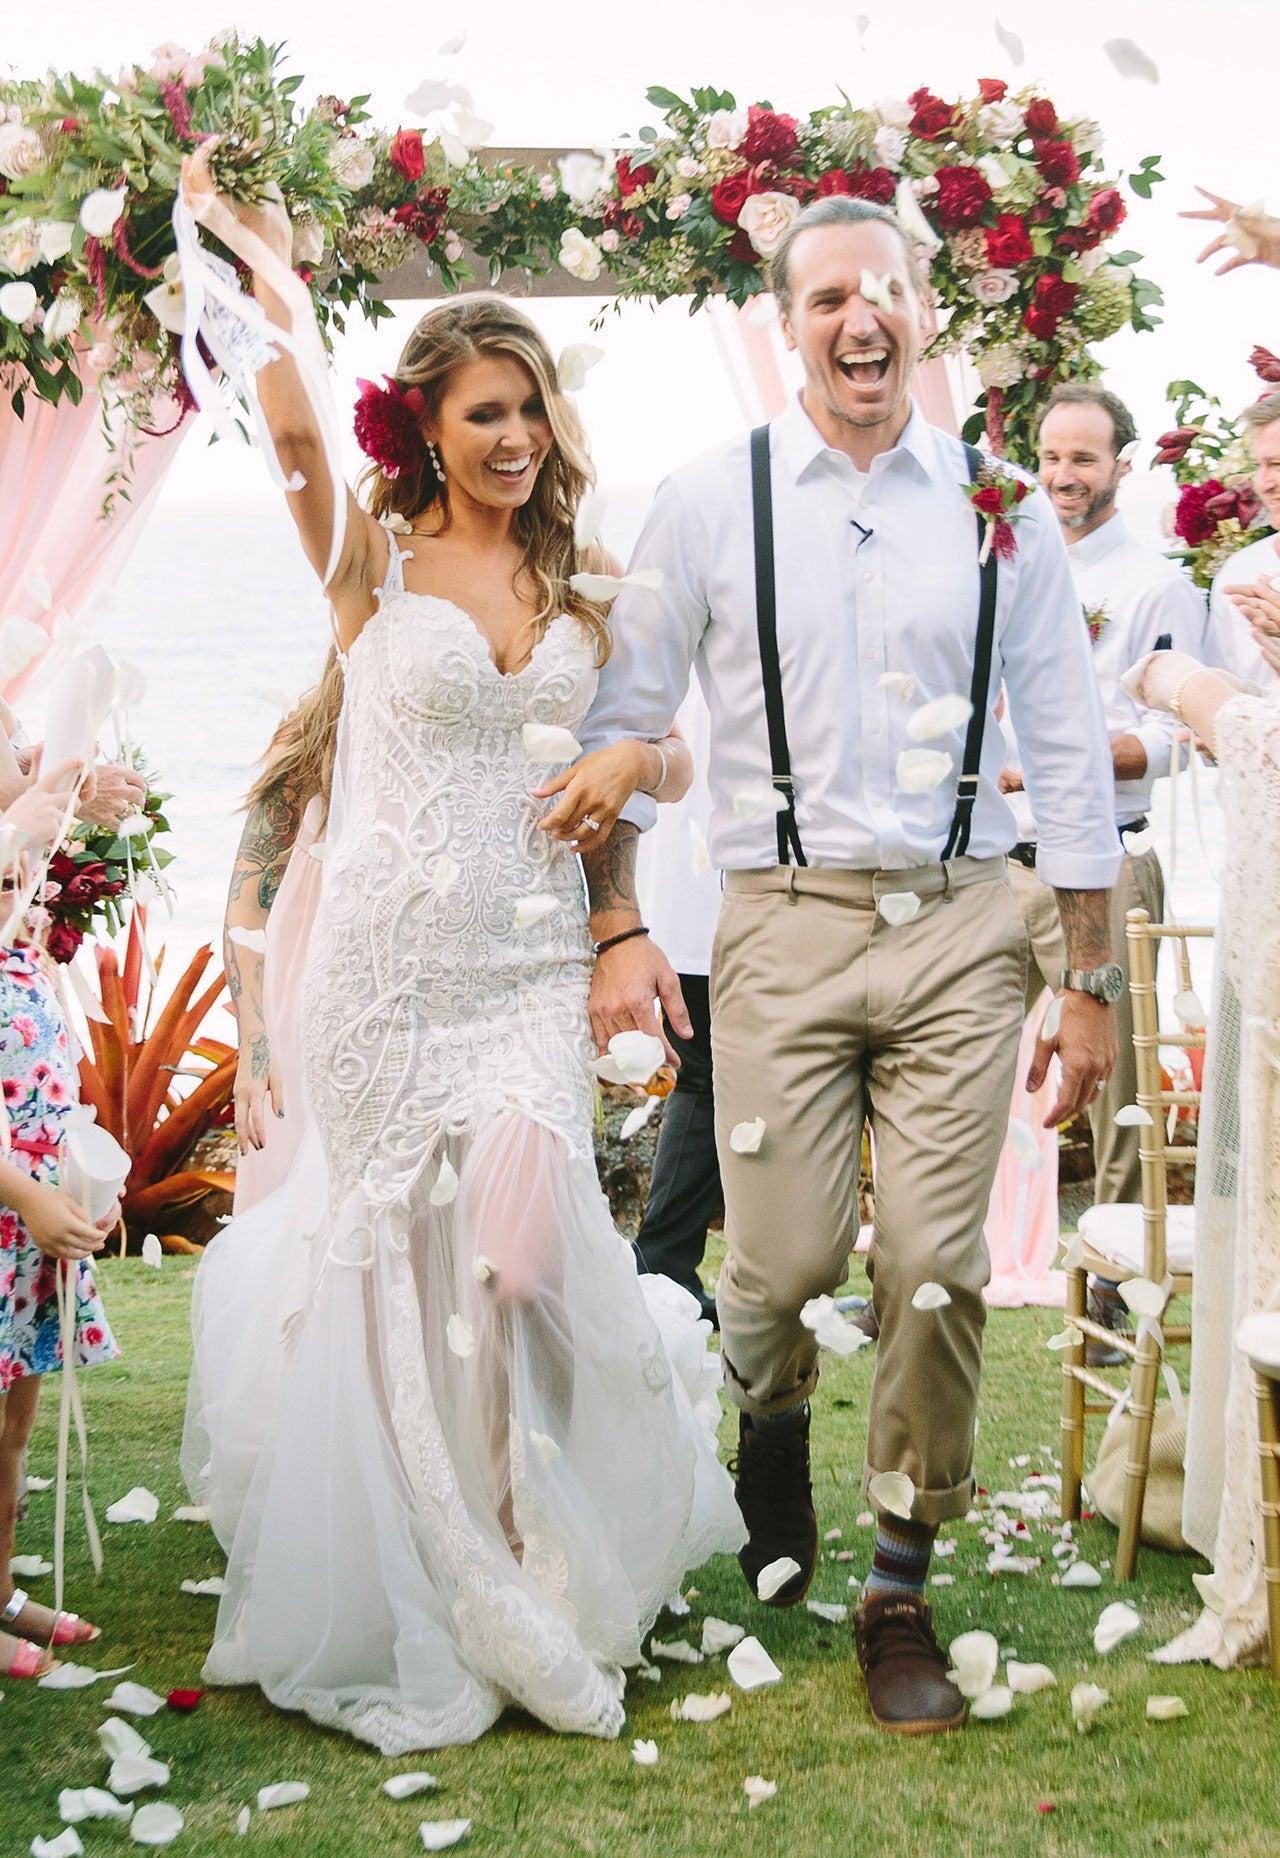 14 most gorgeous celeb wedding dresses of 2016 entertainment tonight 14 most gorgeous celeb wedding dresses of 2016 junglespirit Choice Image